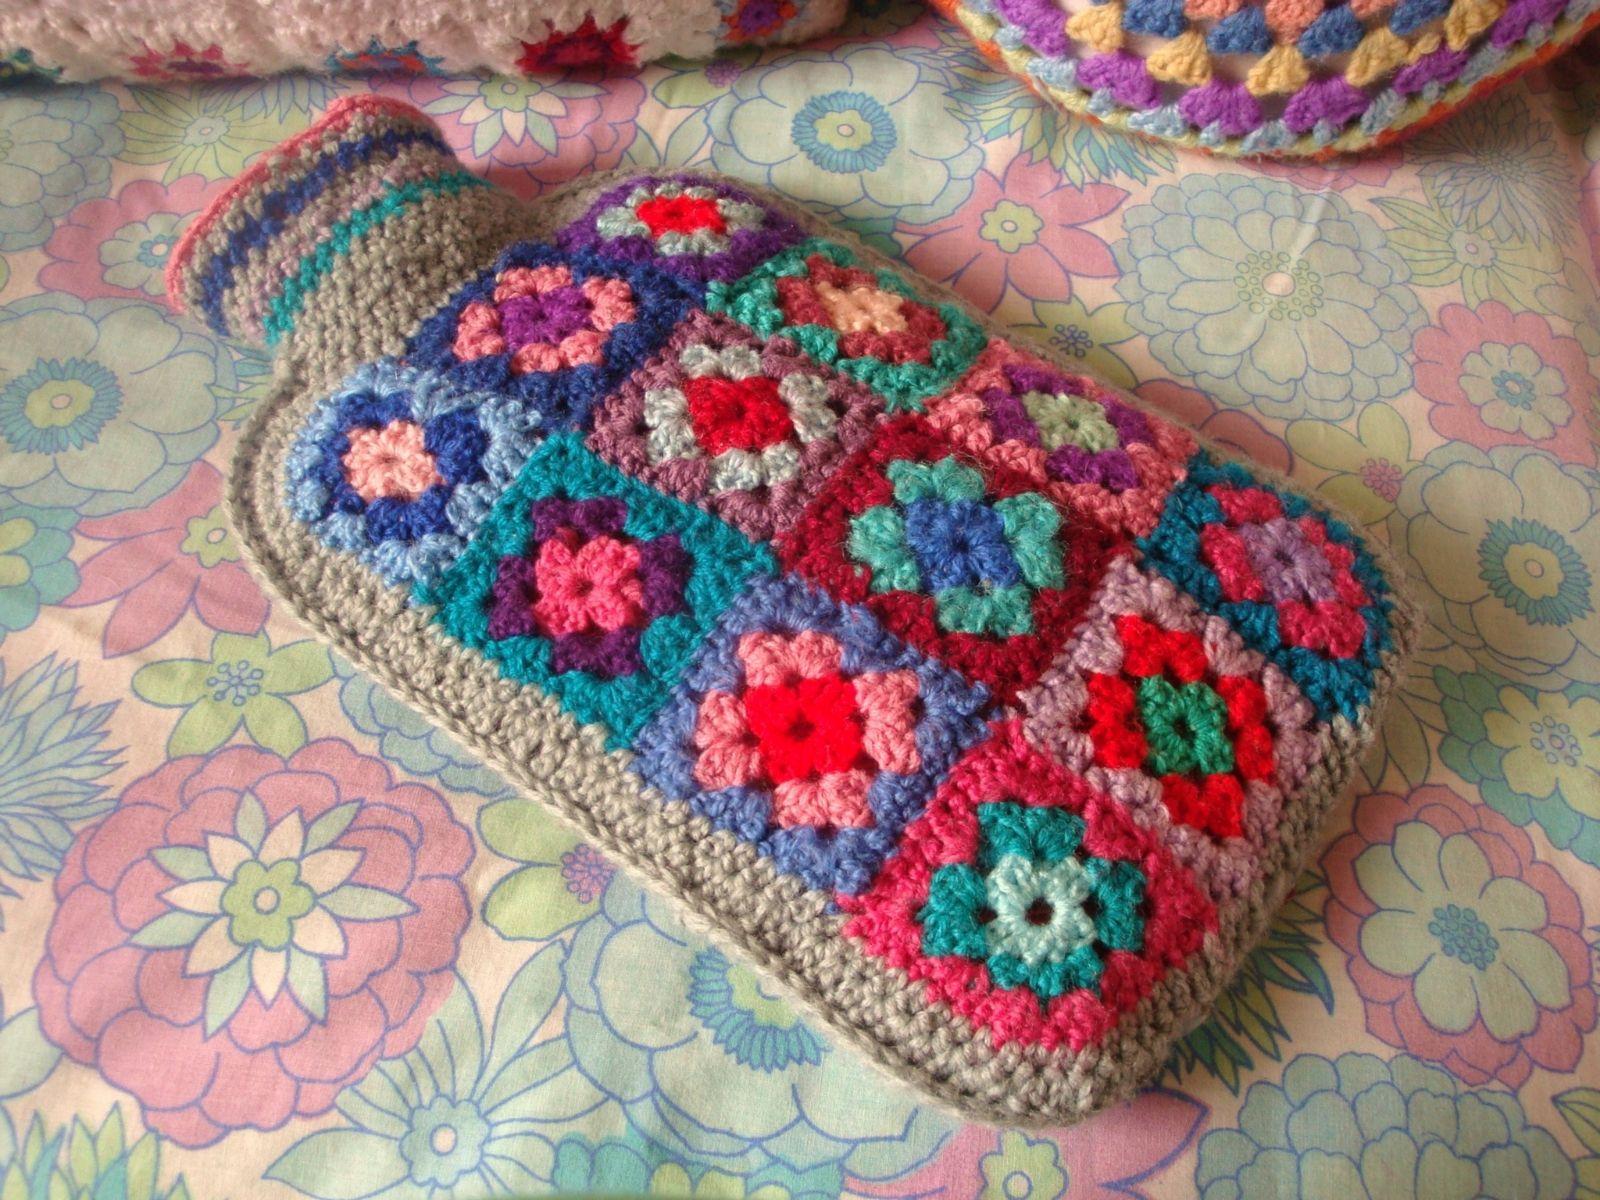 Pin by Jessica Skipper on Crochet | Pinterest | Water bottle covers ...